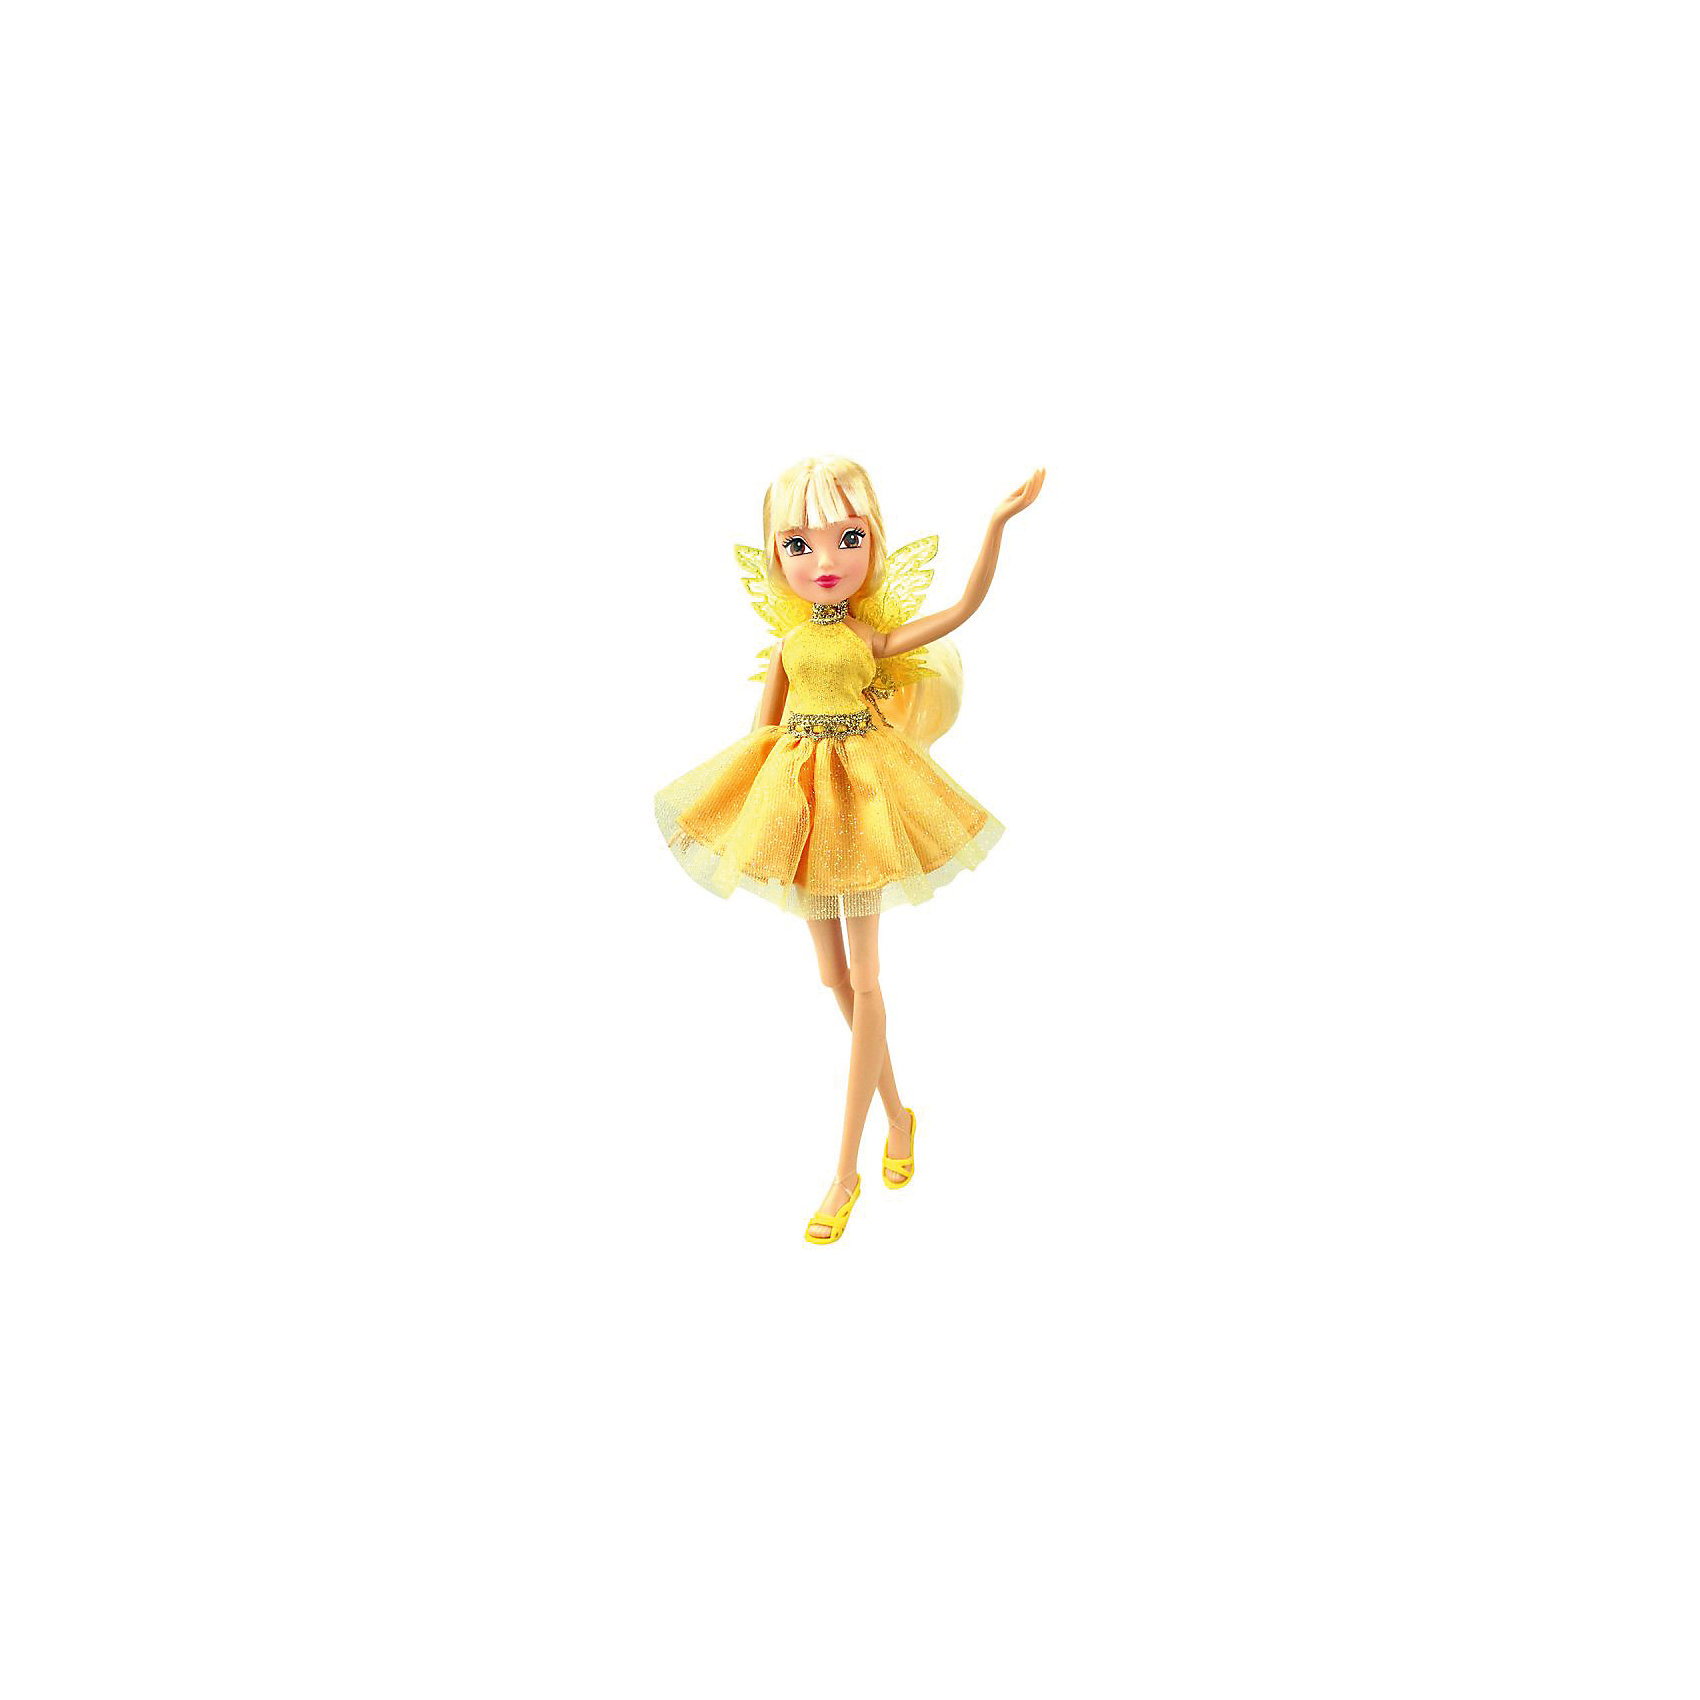 Кукла Winx Club Мода и магия-4 Стелла, 31,5 смПопулярные игрушки<br><br><br>Ширина мм: 130<br>Глубина мм: 60<br>Высота мм: 315<br>Вес г: 225<br>Возраст от месяцев: 36<br>Возраст до месяцев: 120<br>Пол: Женский<br>Возраст: Детский<br>SKU: 7097664